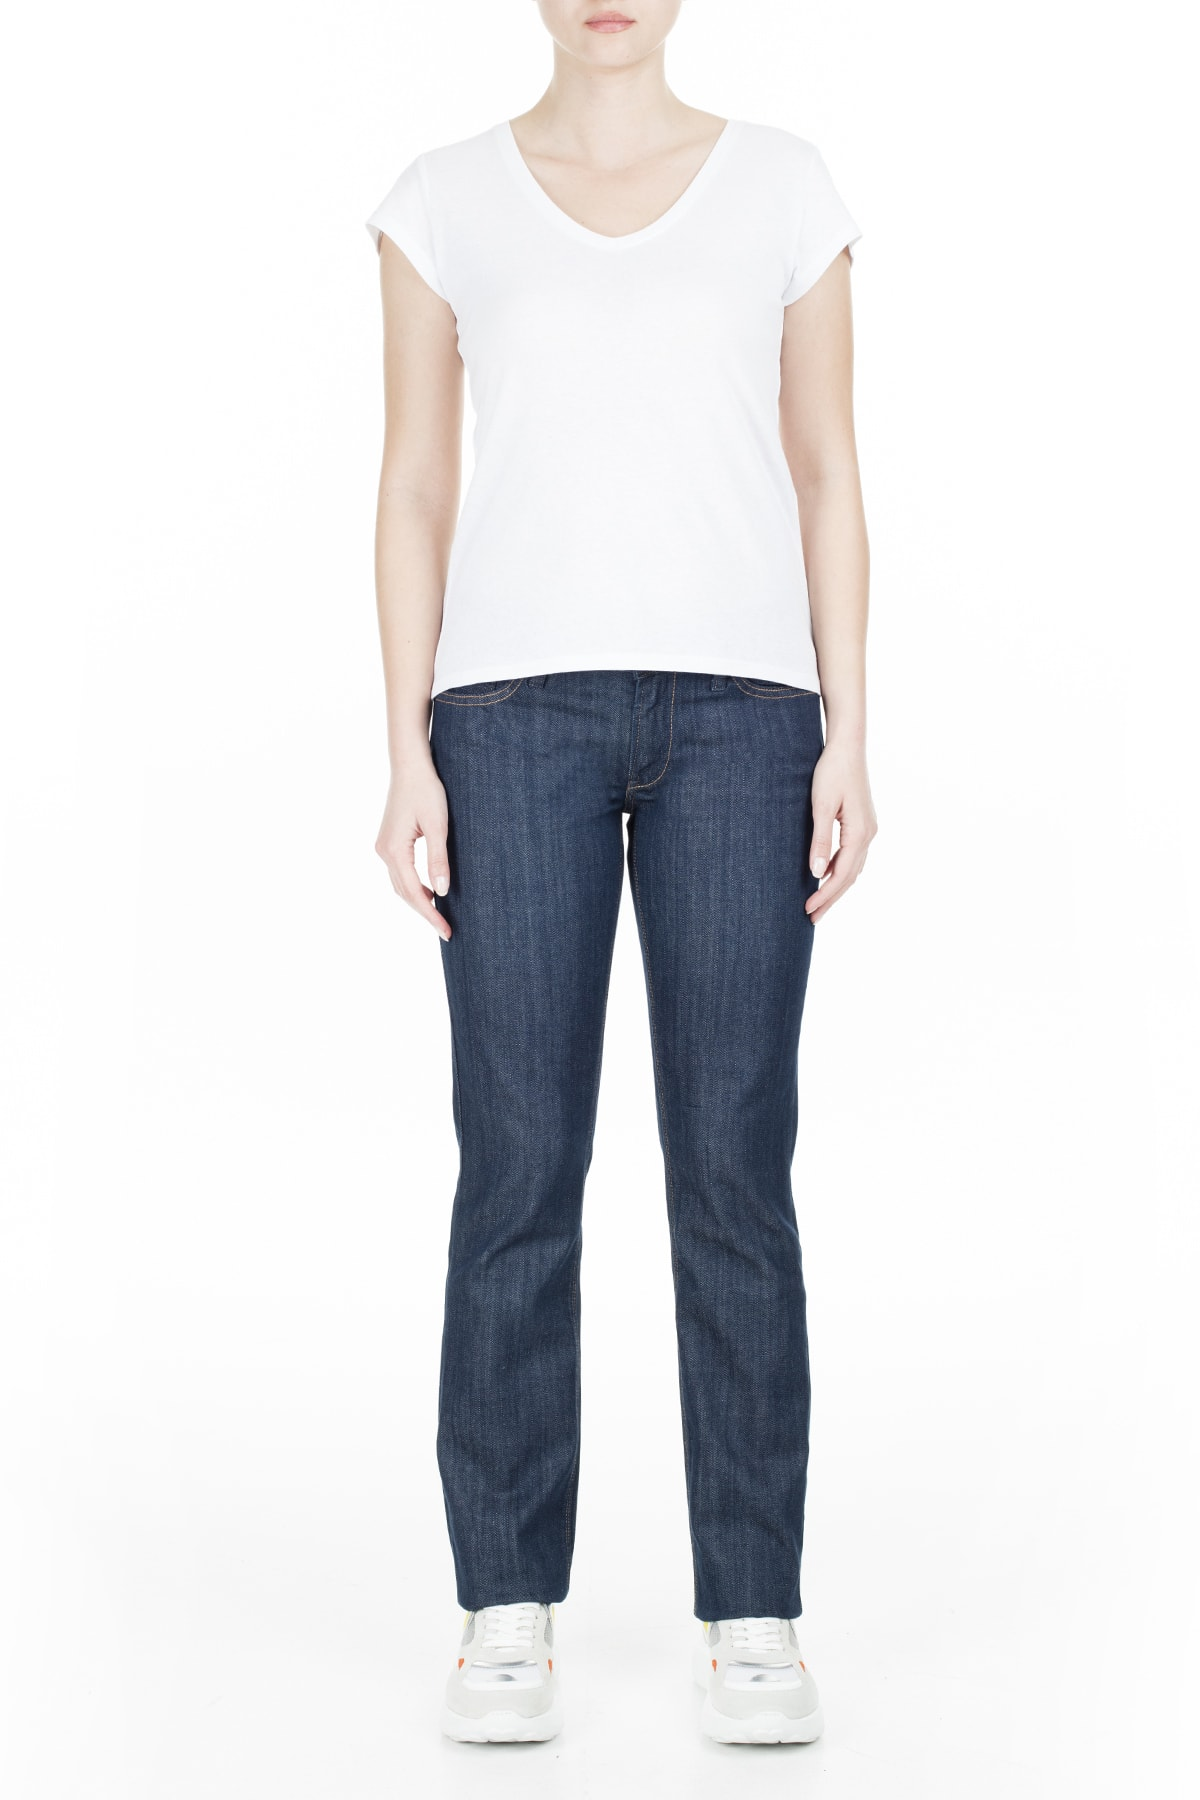 Replay Jeans Kadın Kot Pantolon Zoxwv591 0